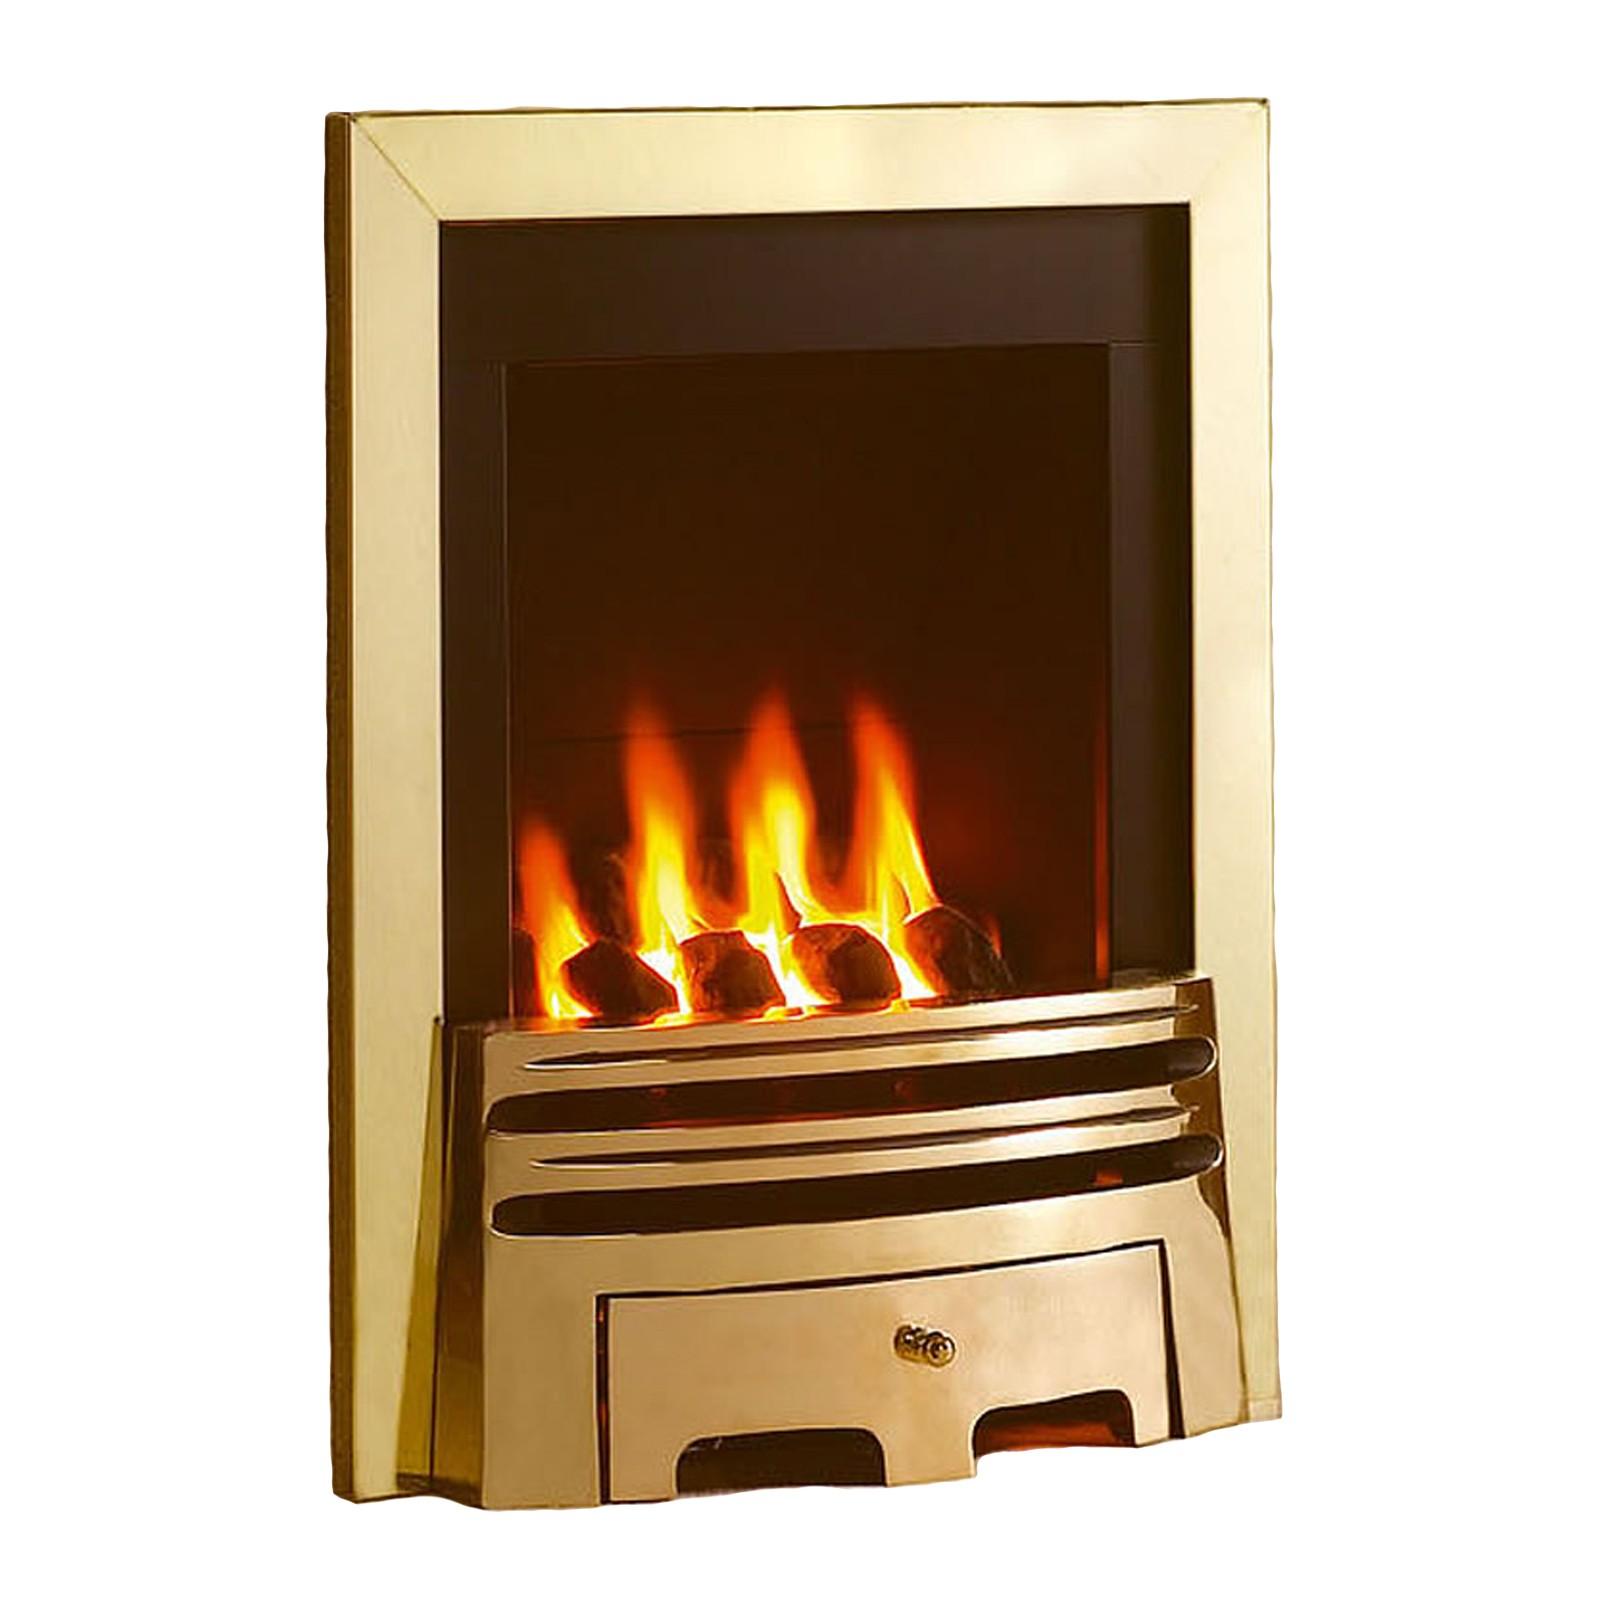 The Classic Flavel Windsor Slimline Inset Brass Gas Fire